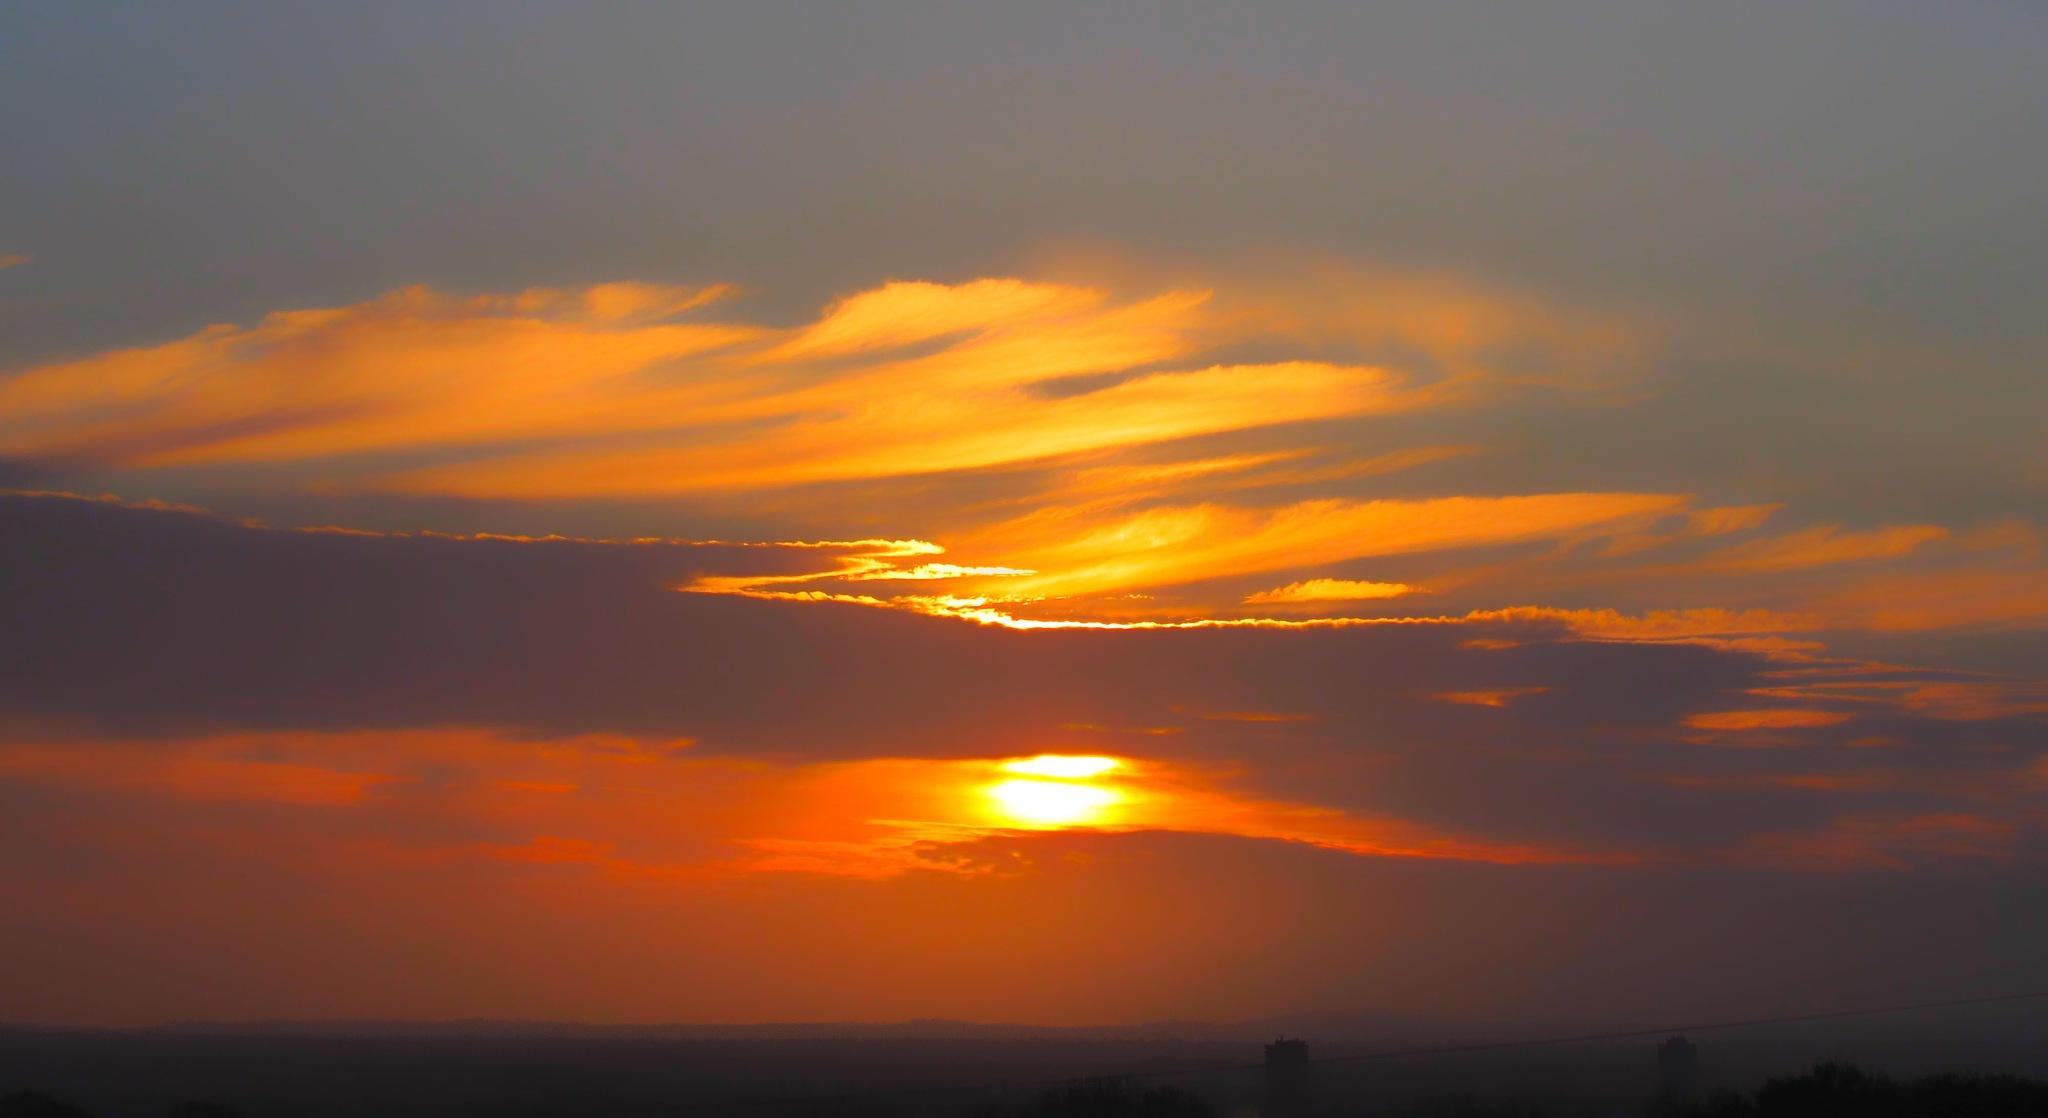 Sunrise over Coventry by Mark Pemberton